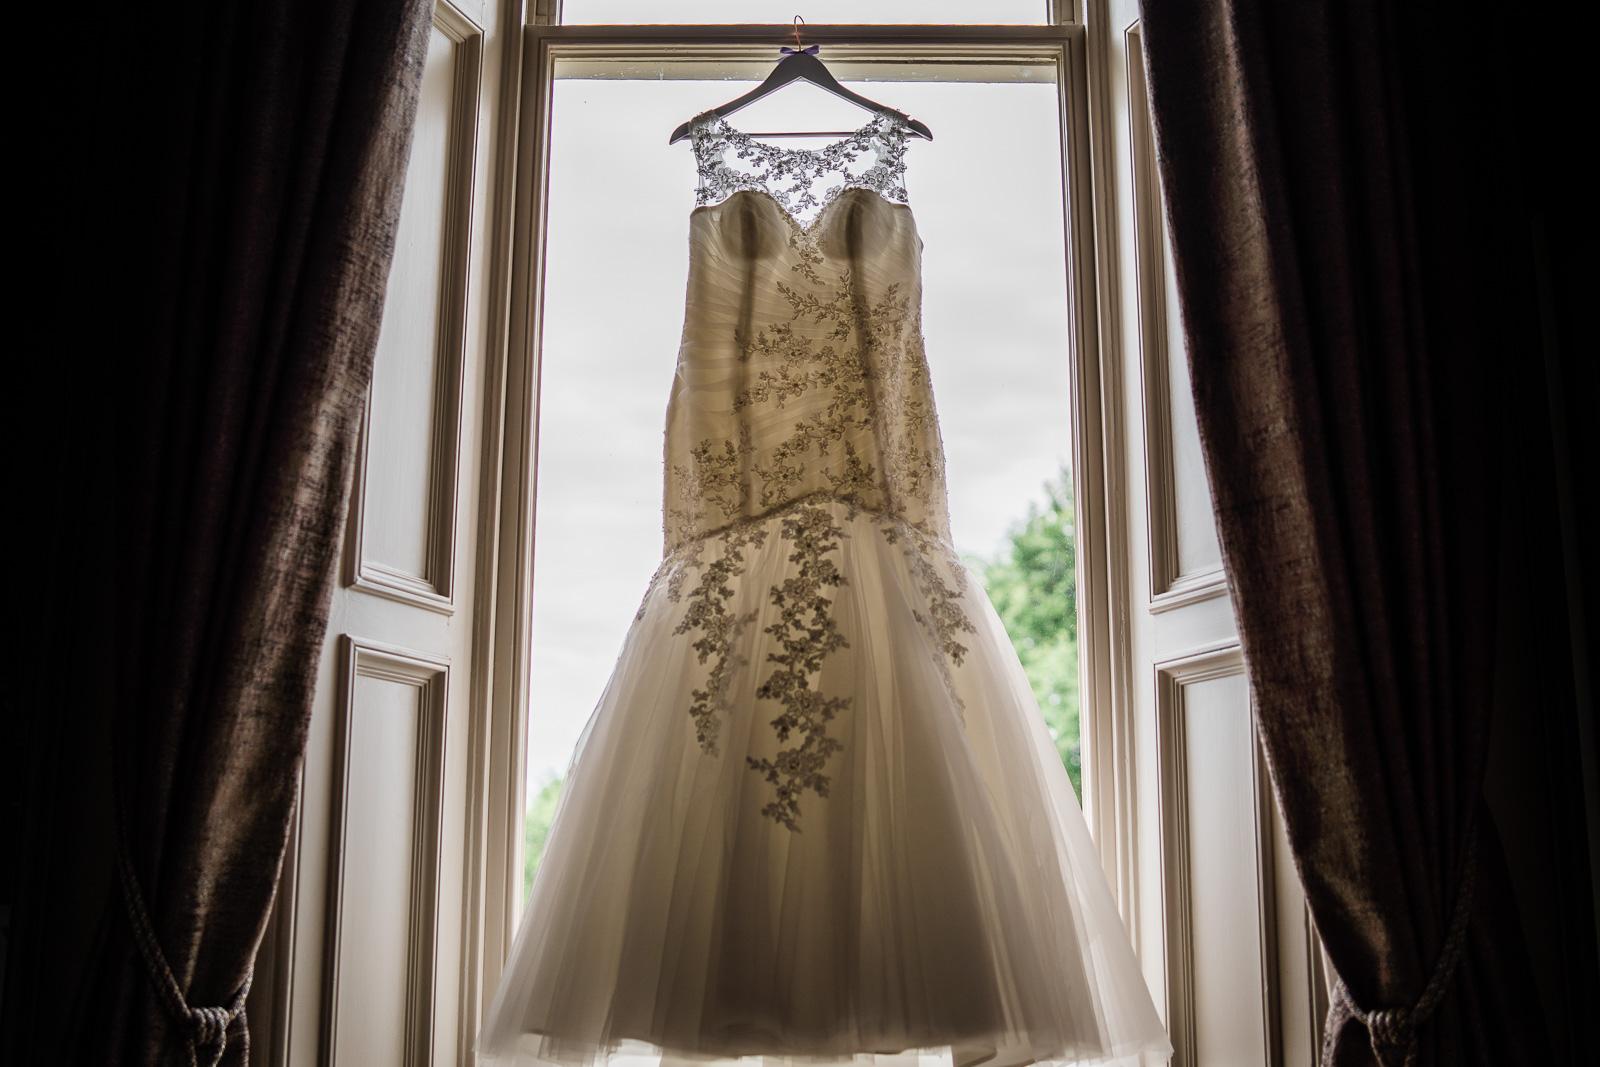 cornhill_castle_wedding_biggar_dearlyphotography (35 of 448).jpg